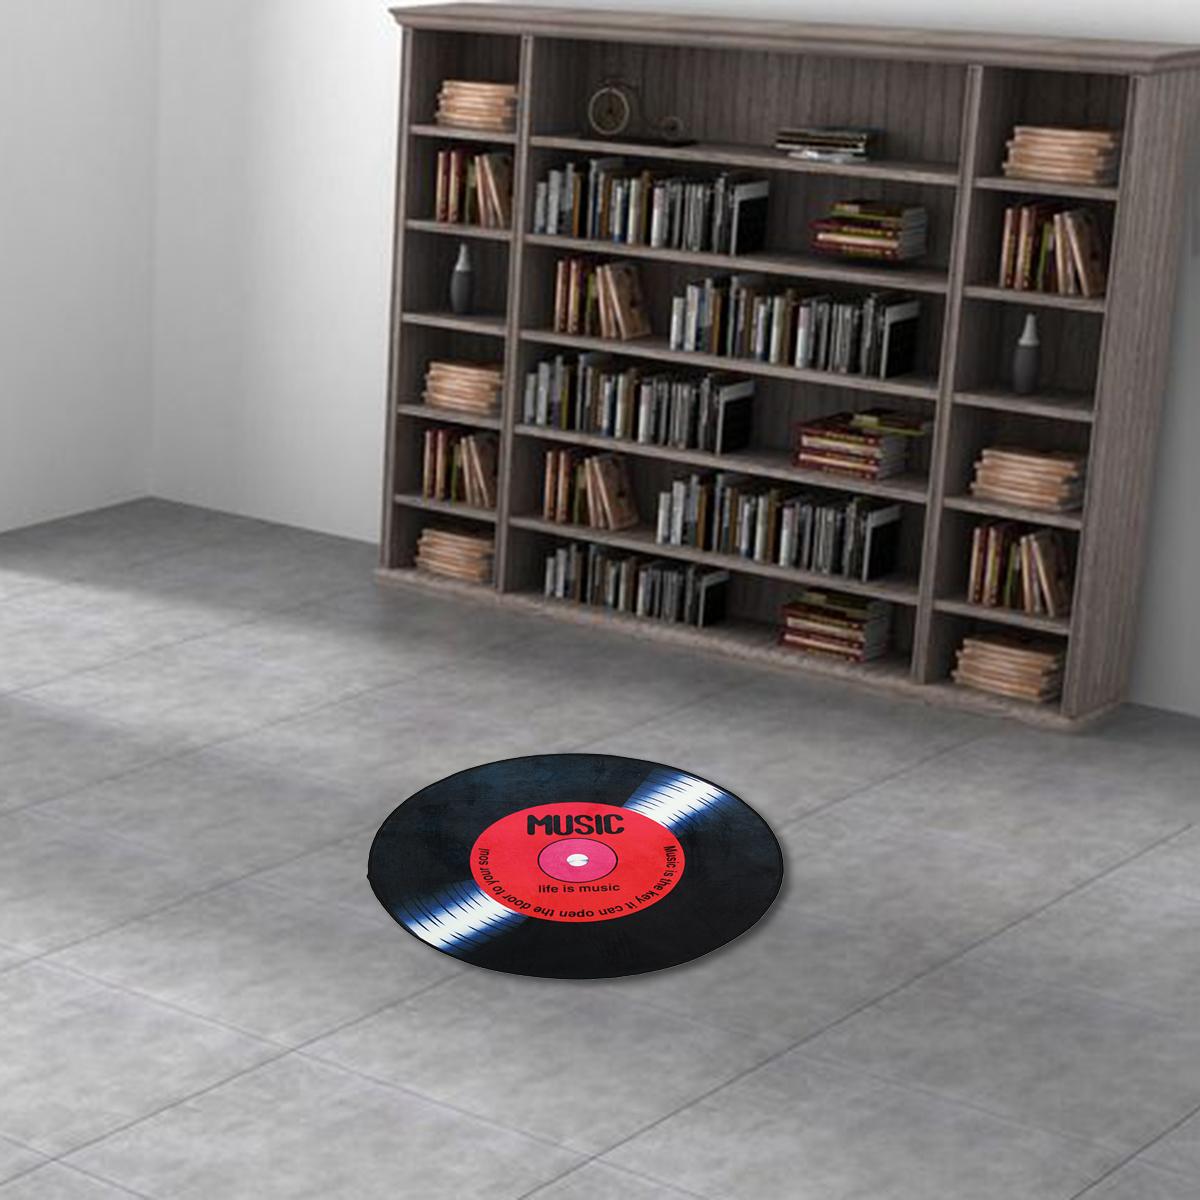 60 80 100 120cm Vinyl Record Printed Soft Fabric Round Floor Mat Carpet Room Area Bedroom Rug